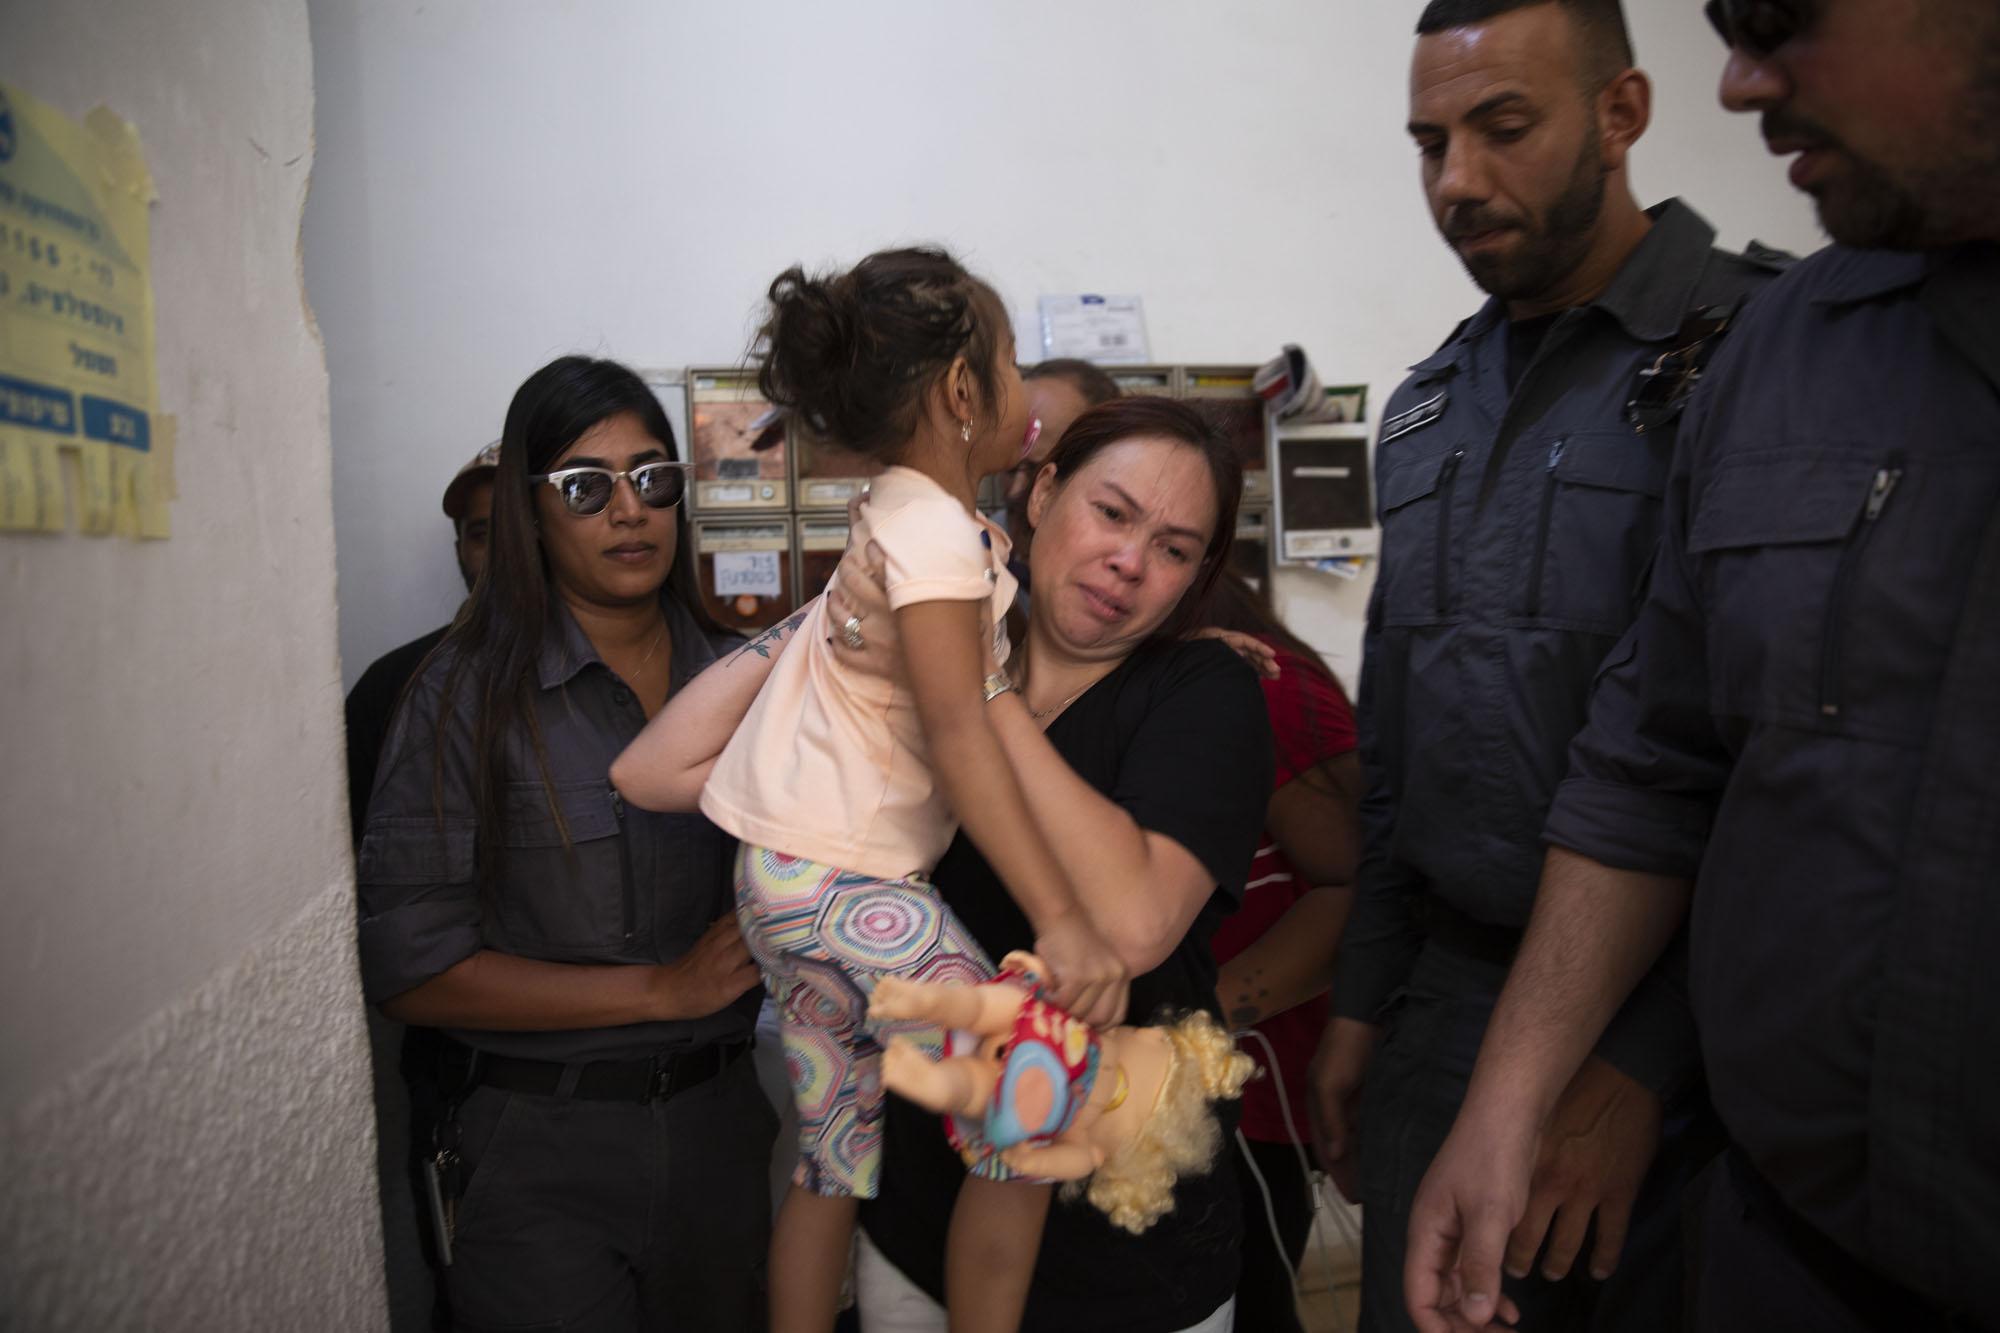 Israeli immigration agents arrest migrant worker Geraldine Esta and her daughters in their home in Ramat Gan, Israel, July 23, 2019. (Oren Ziv/Activestills.org)